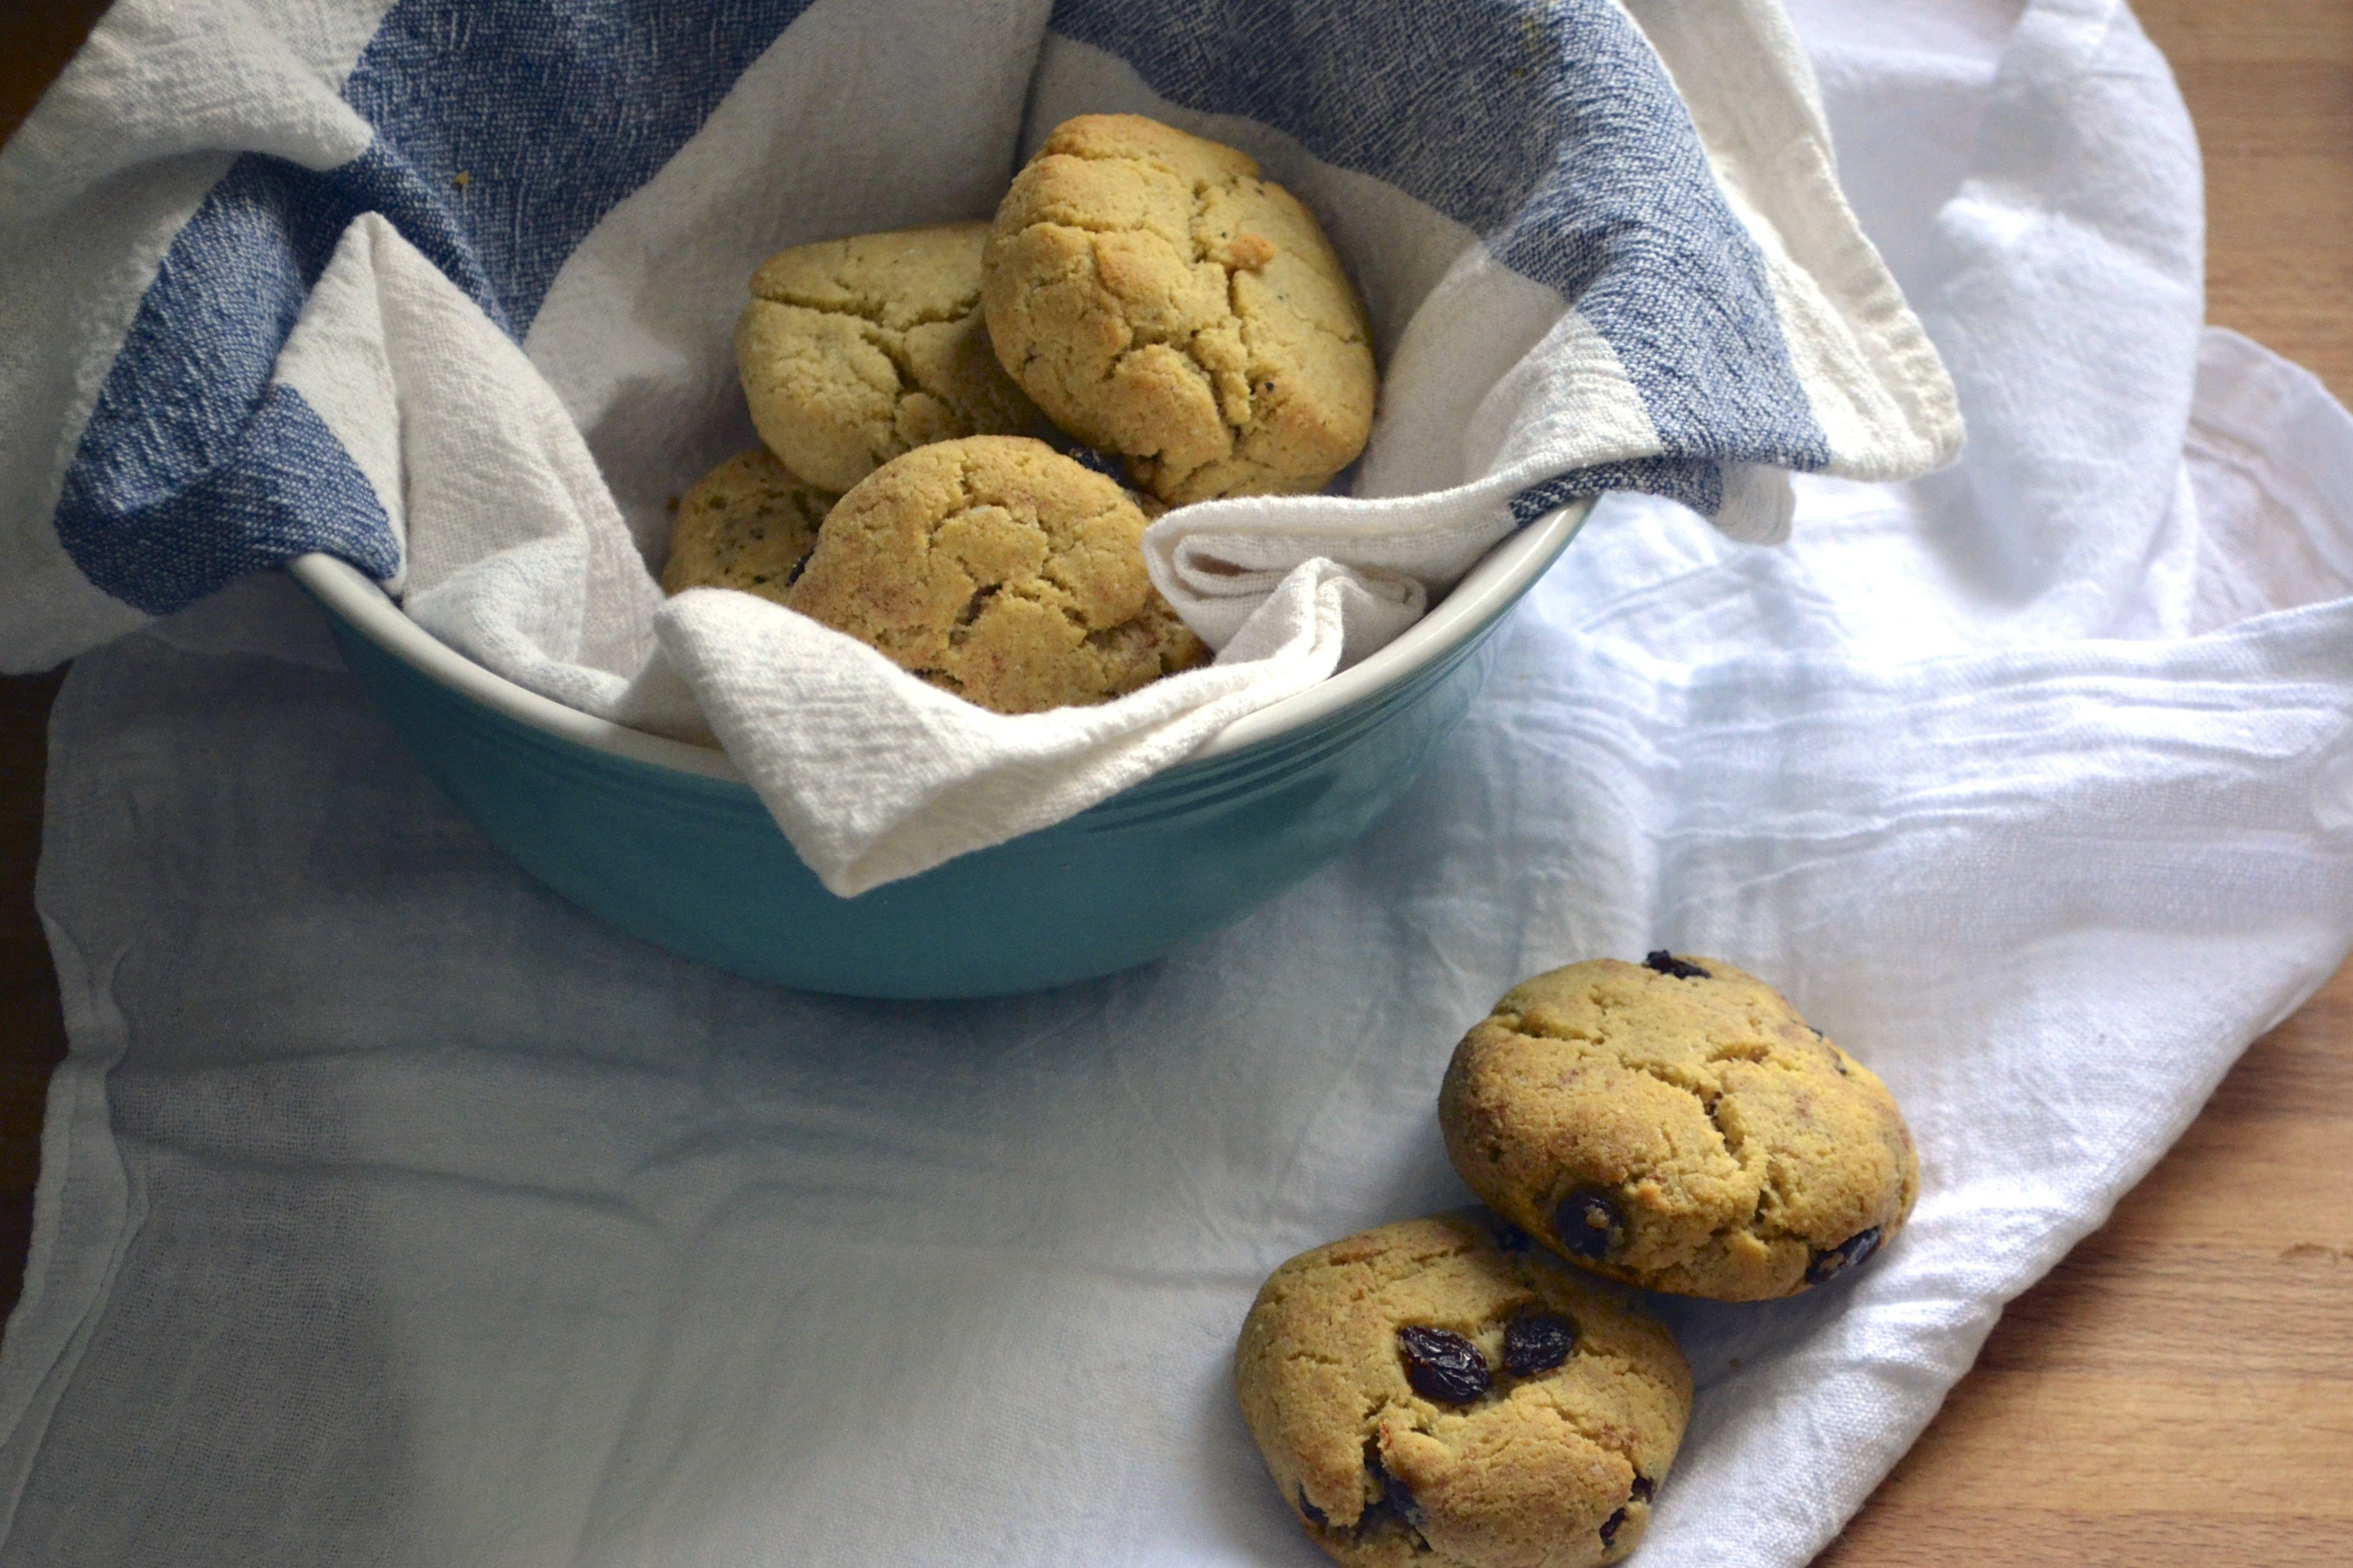 Cinnamon Raisin Biscuits (Grain Free, Gluten Free, Paleo) / Big Eats Tiny Kitchen